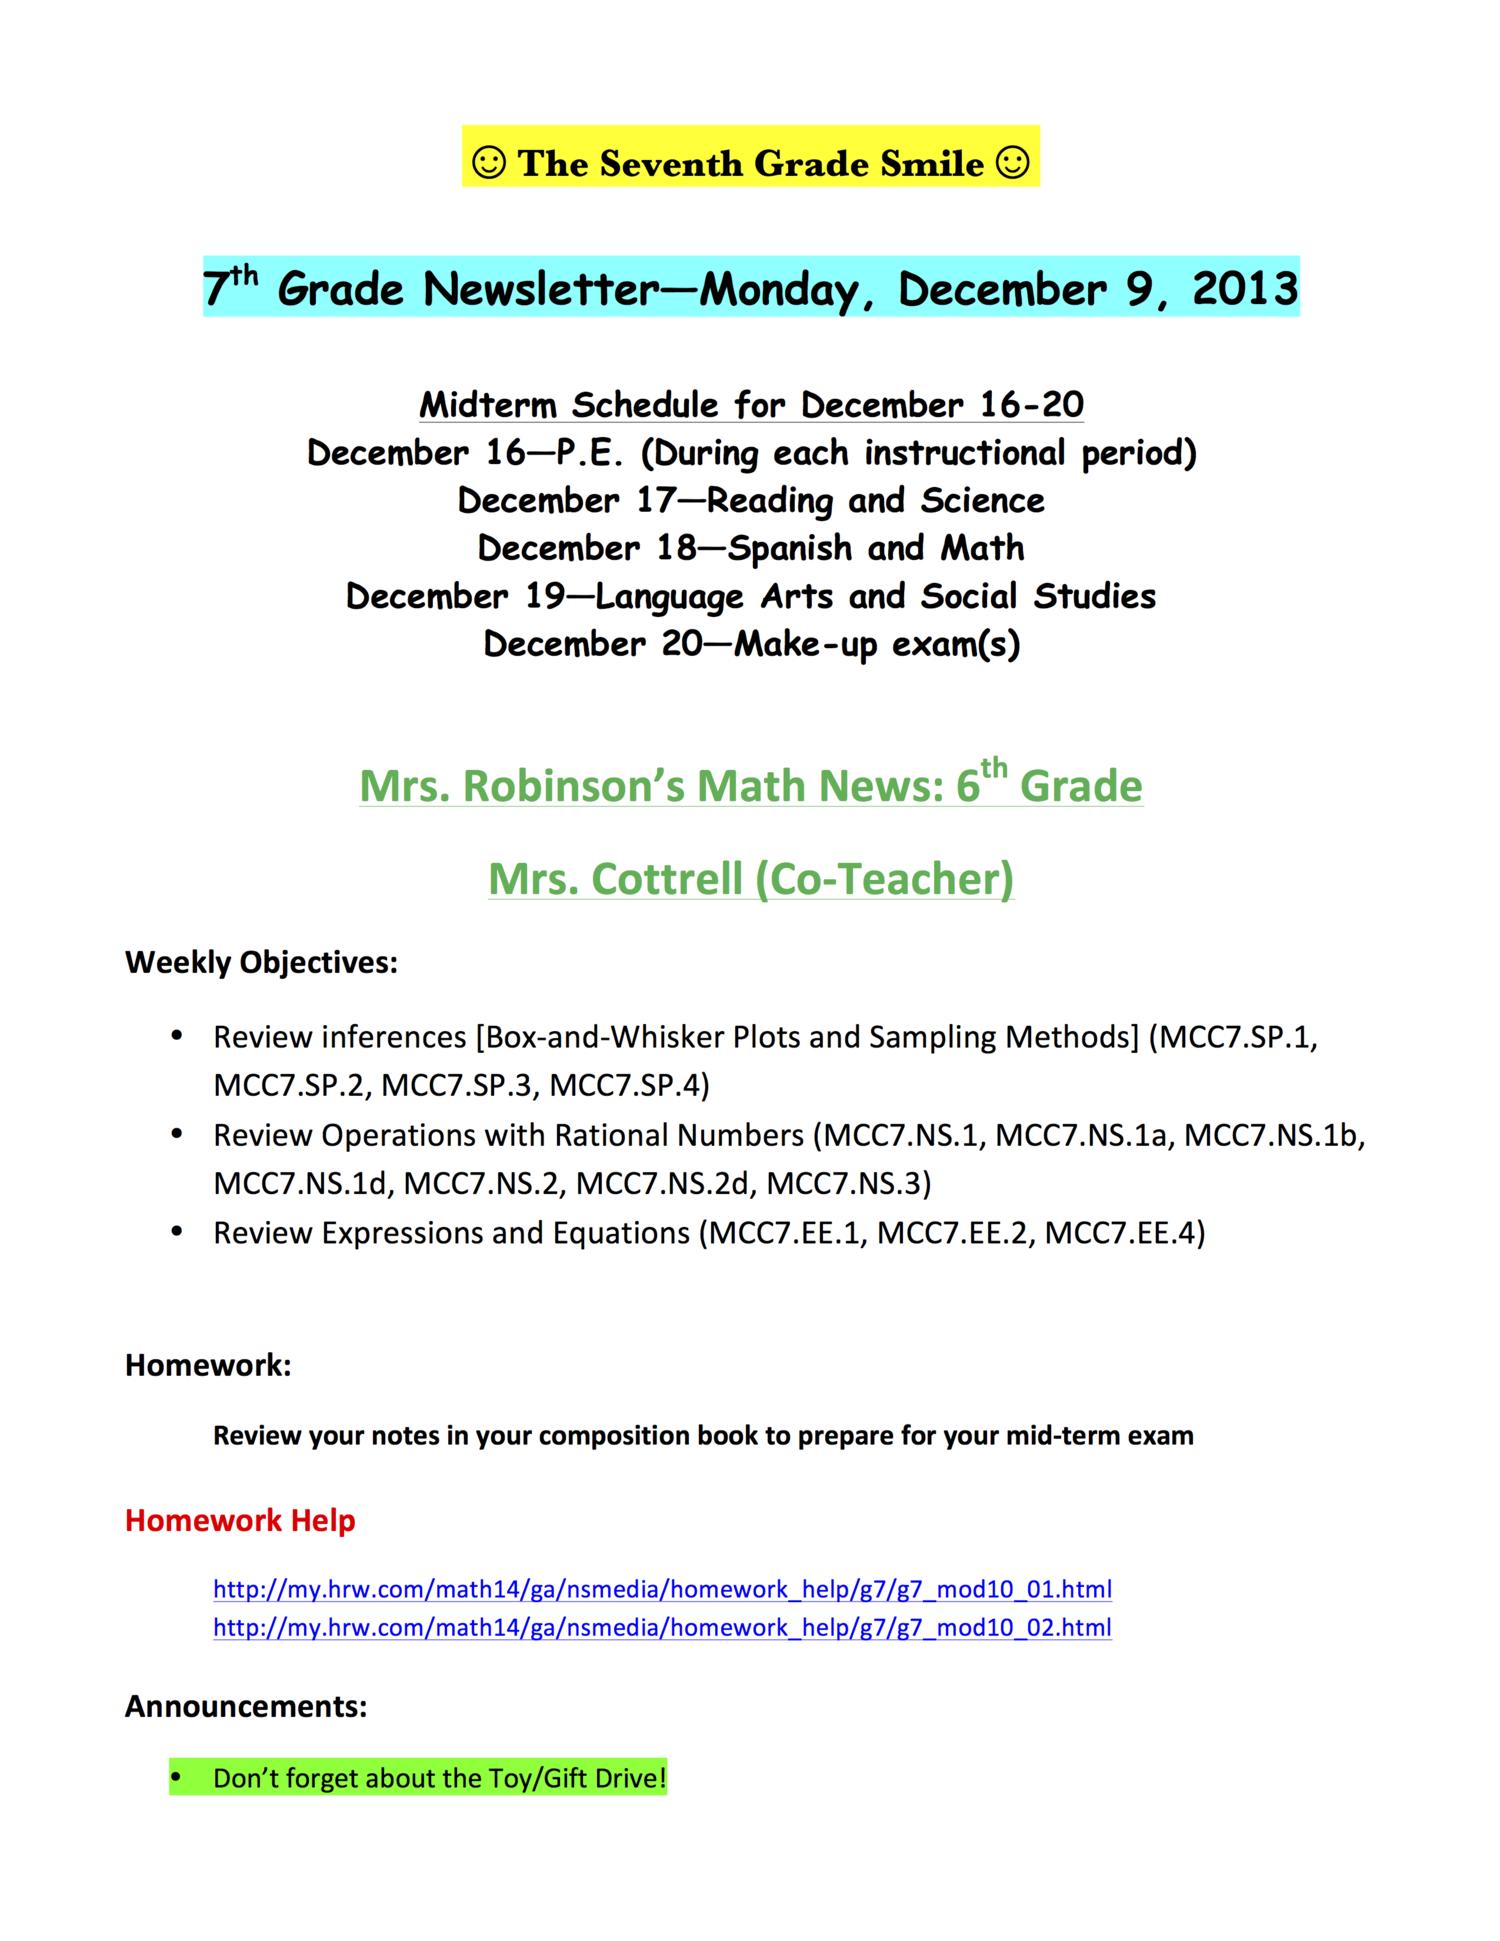 Monday, December 9, 2013 — Hapeville Charter Middle School